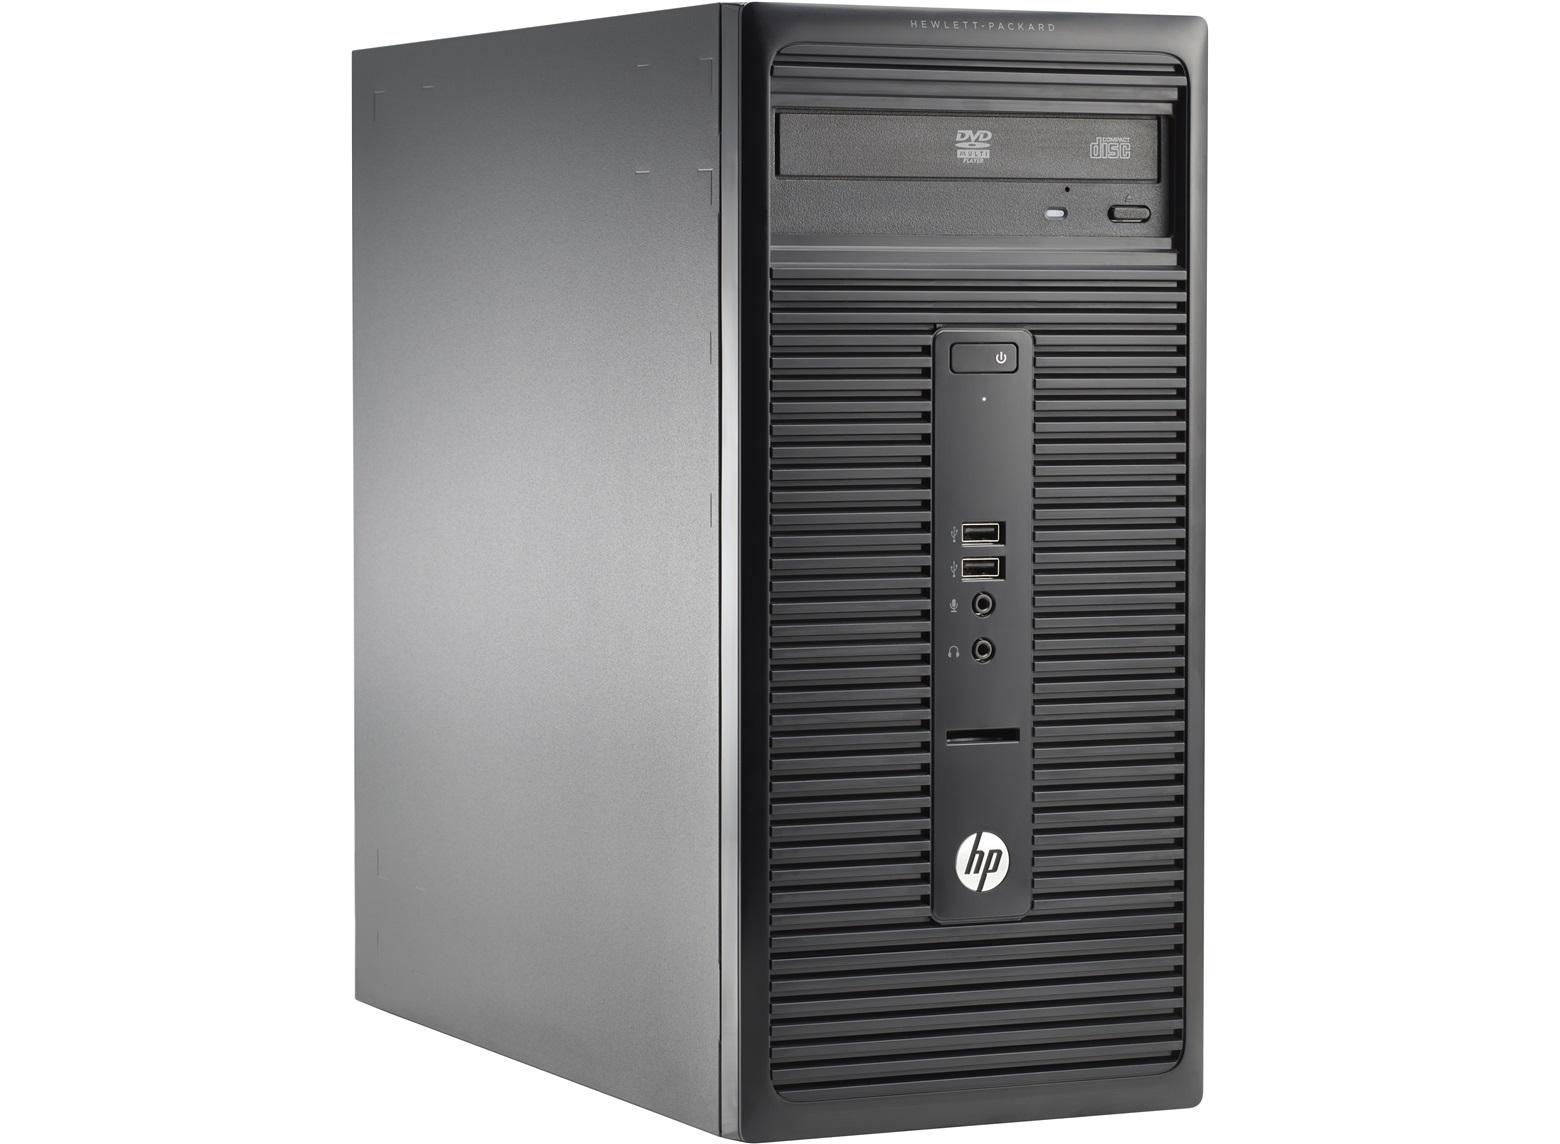 Máy bộ HP 280 G1 MT, Pentium G3260/2GB/500GB (M7G77PT)